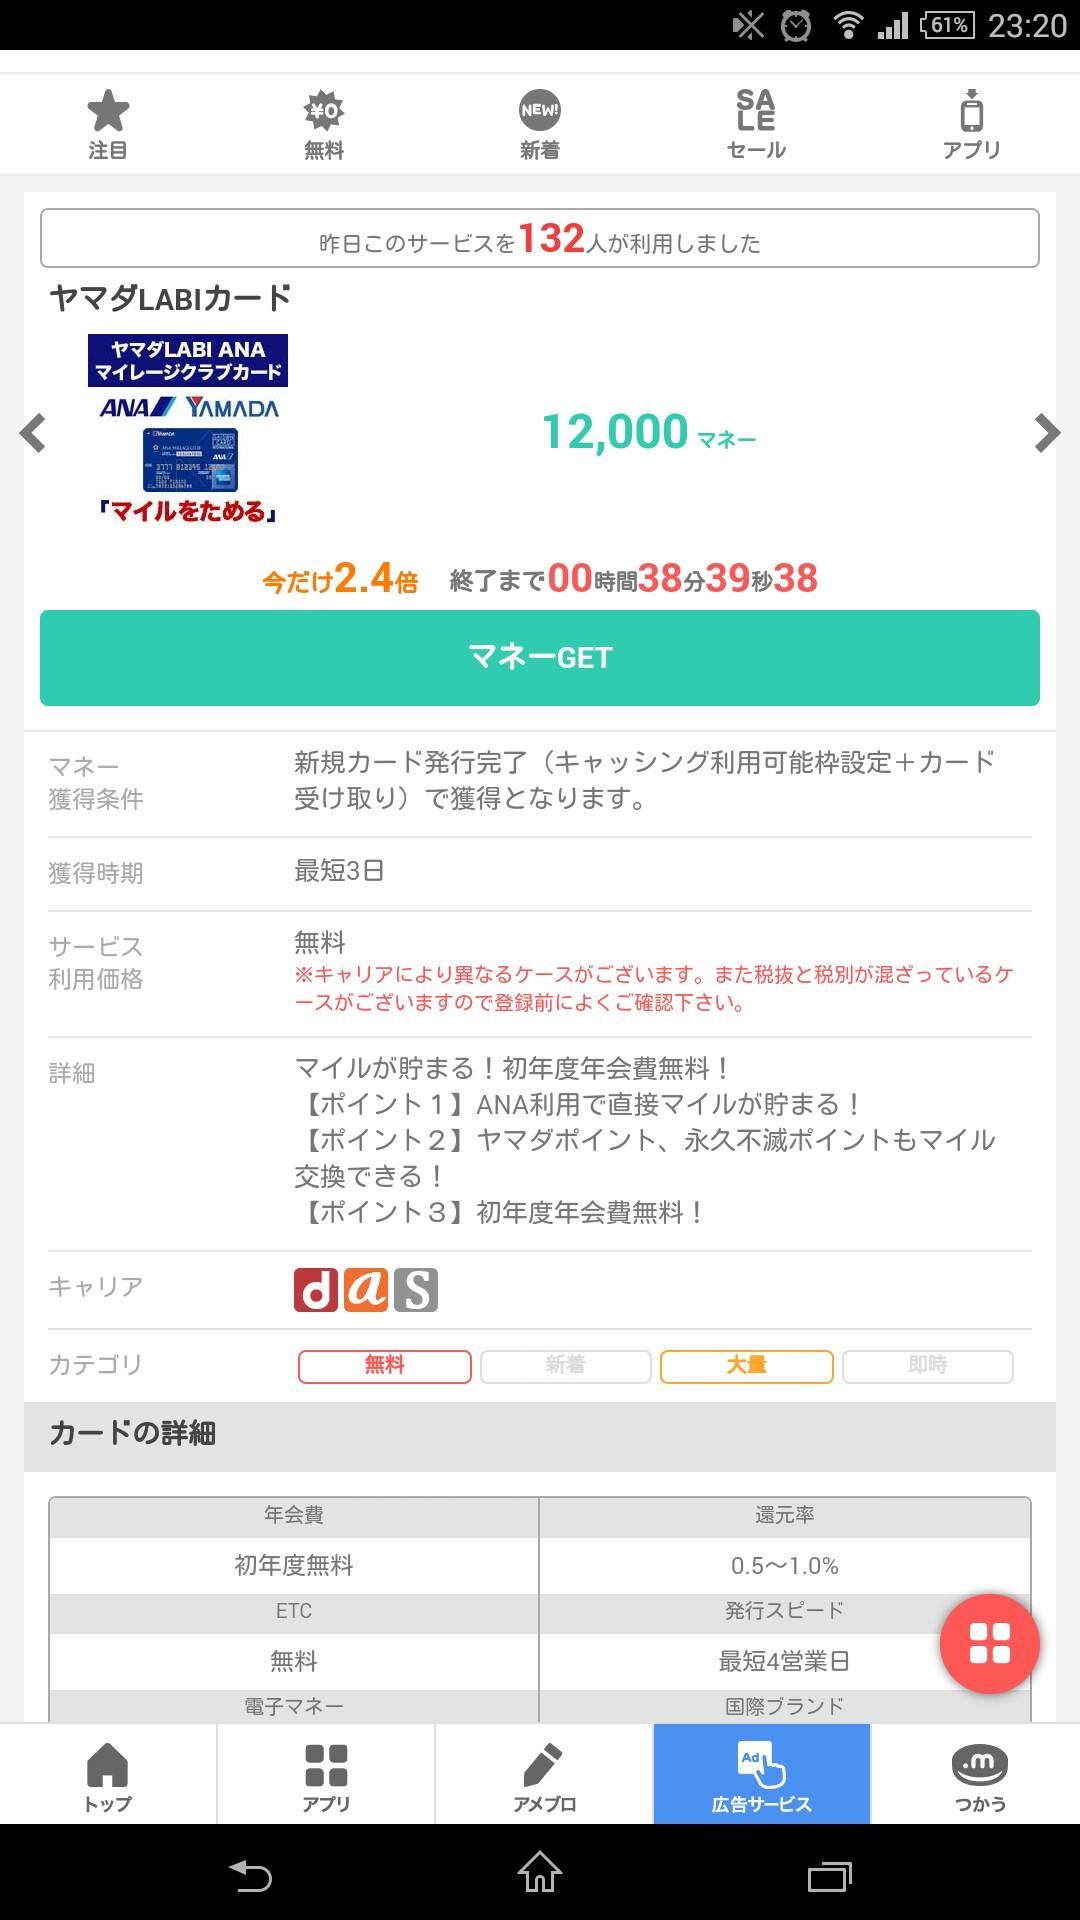 f:id:yoshiki808:20170219212628j:image